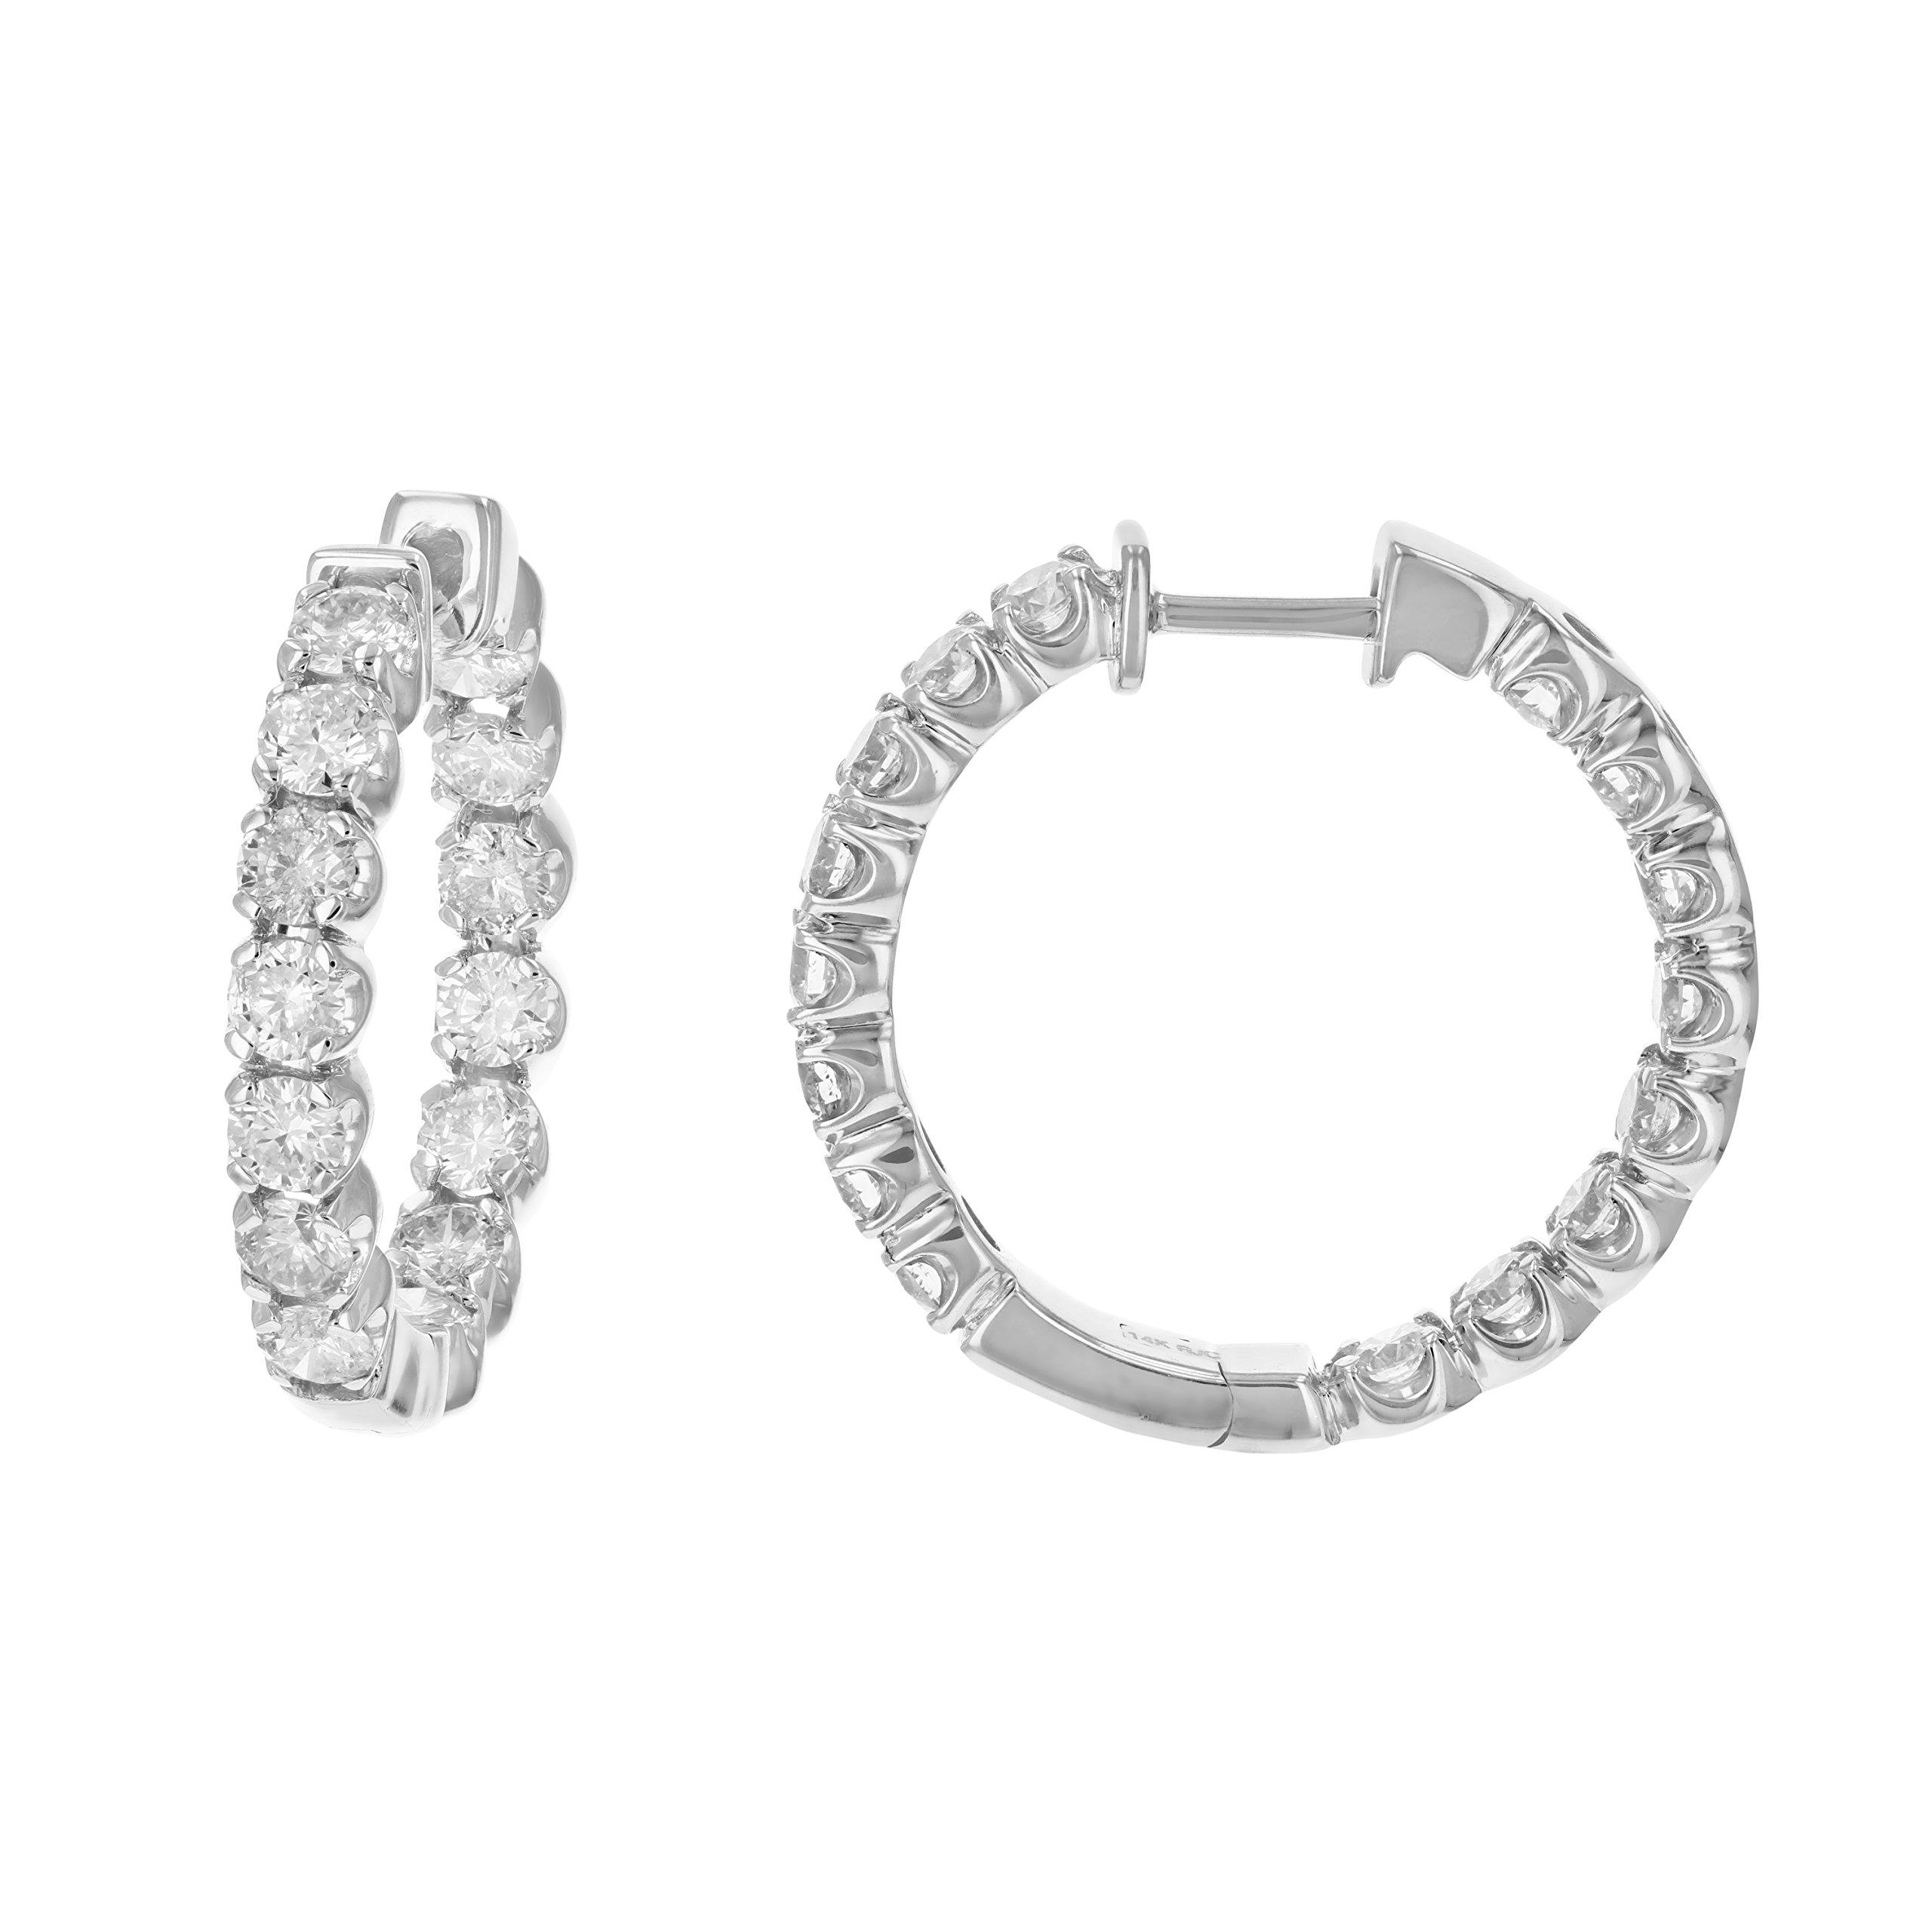 4 cttw SI2-I1 Certified 14K White Gold Diamond Inside Out Hoop Earrings (J-K)